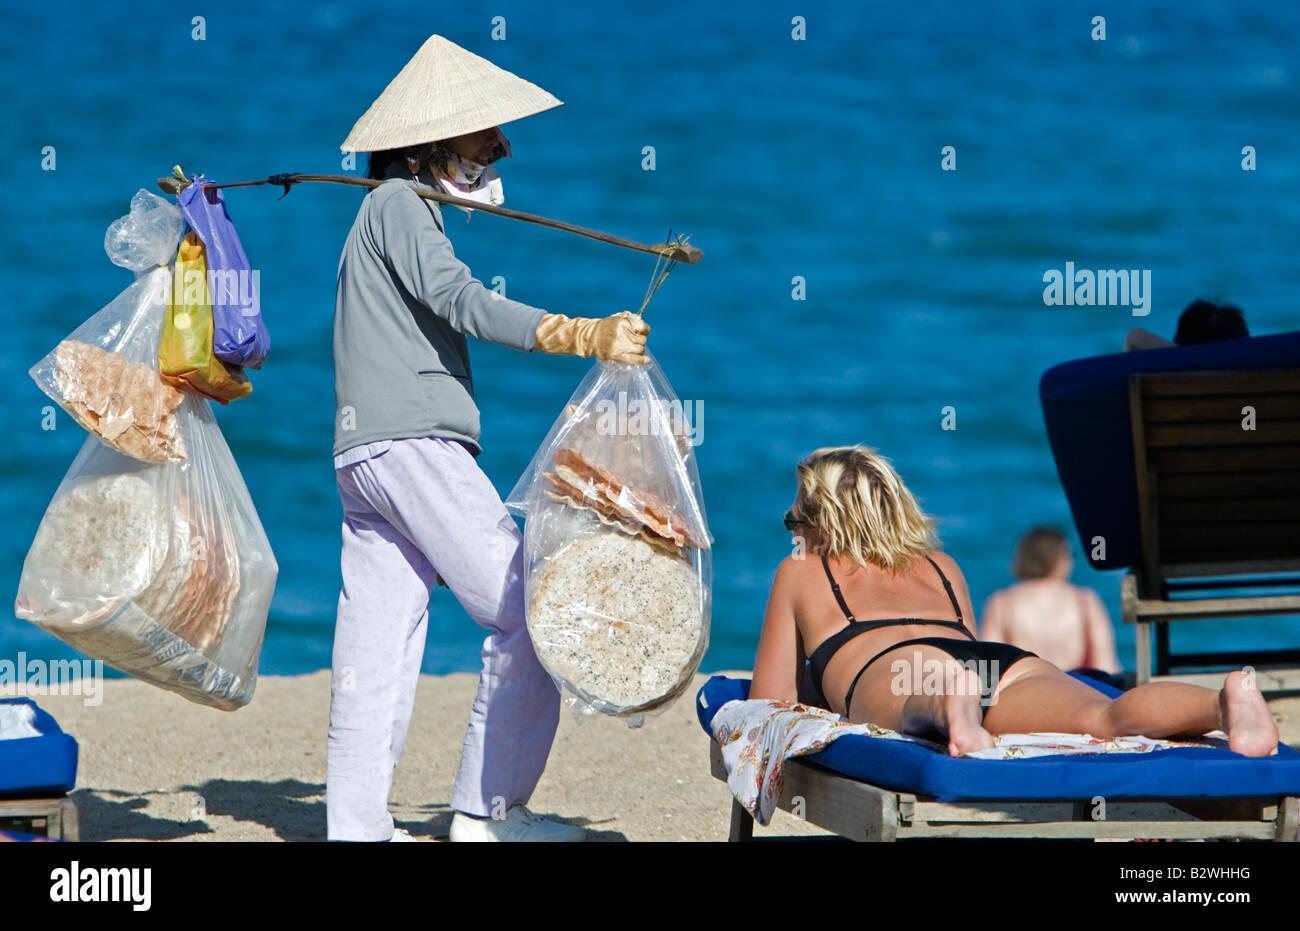 Conical hat woman selling snacks on beach Nha Trang resort Vietnam - Stock Image